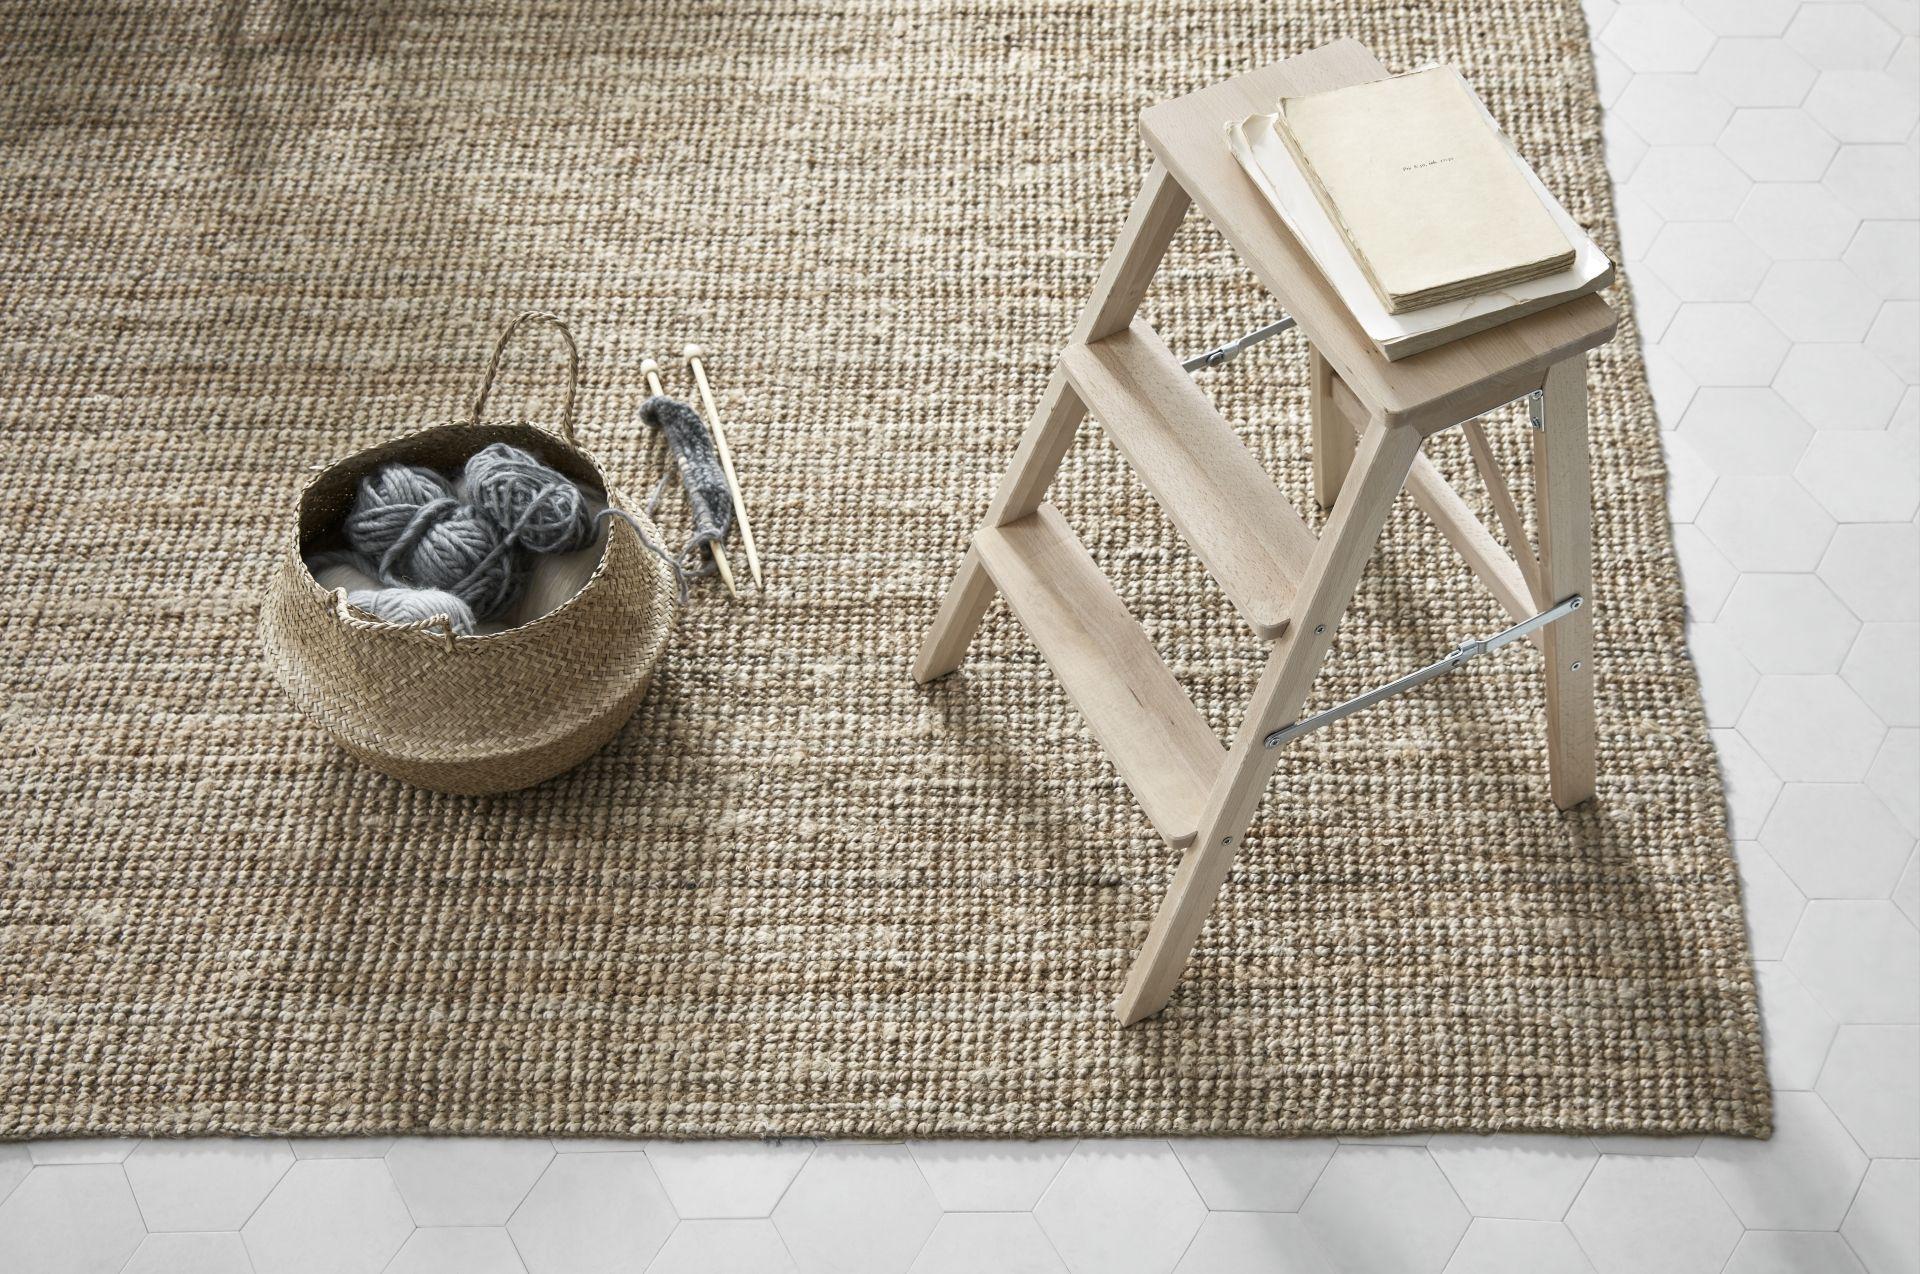 Sisal Tapijt Ikea : Lohals vloerkleed glad geweven naturel ikea furniture